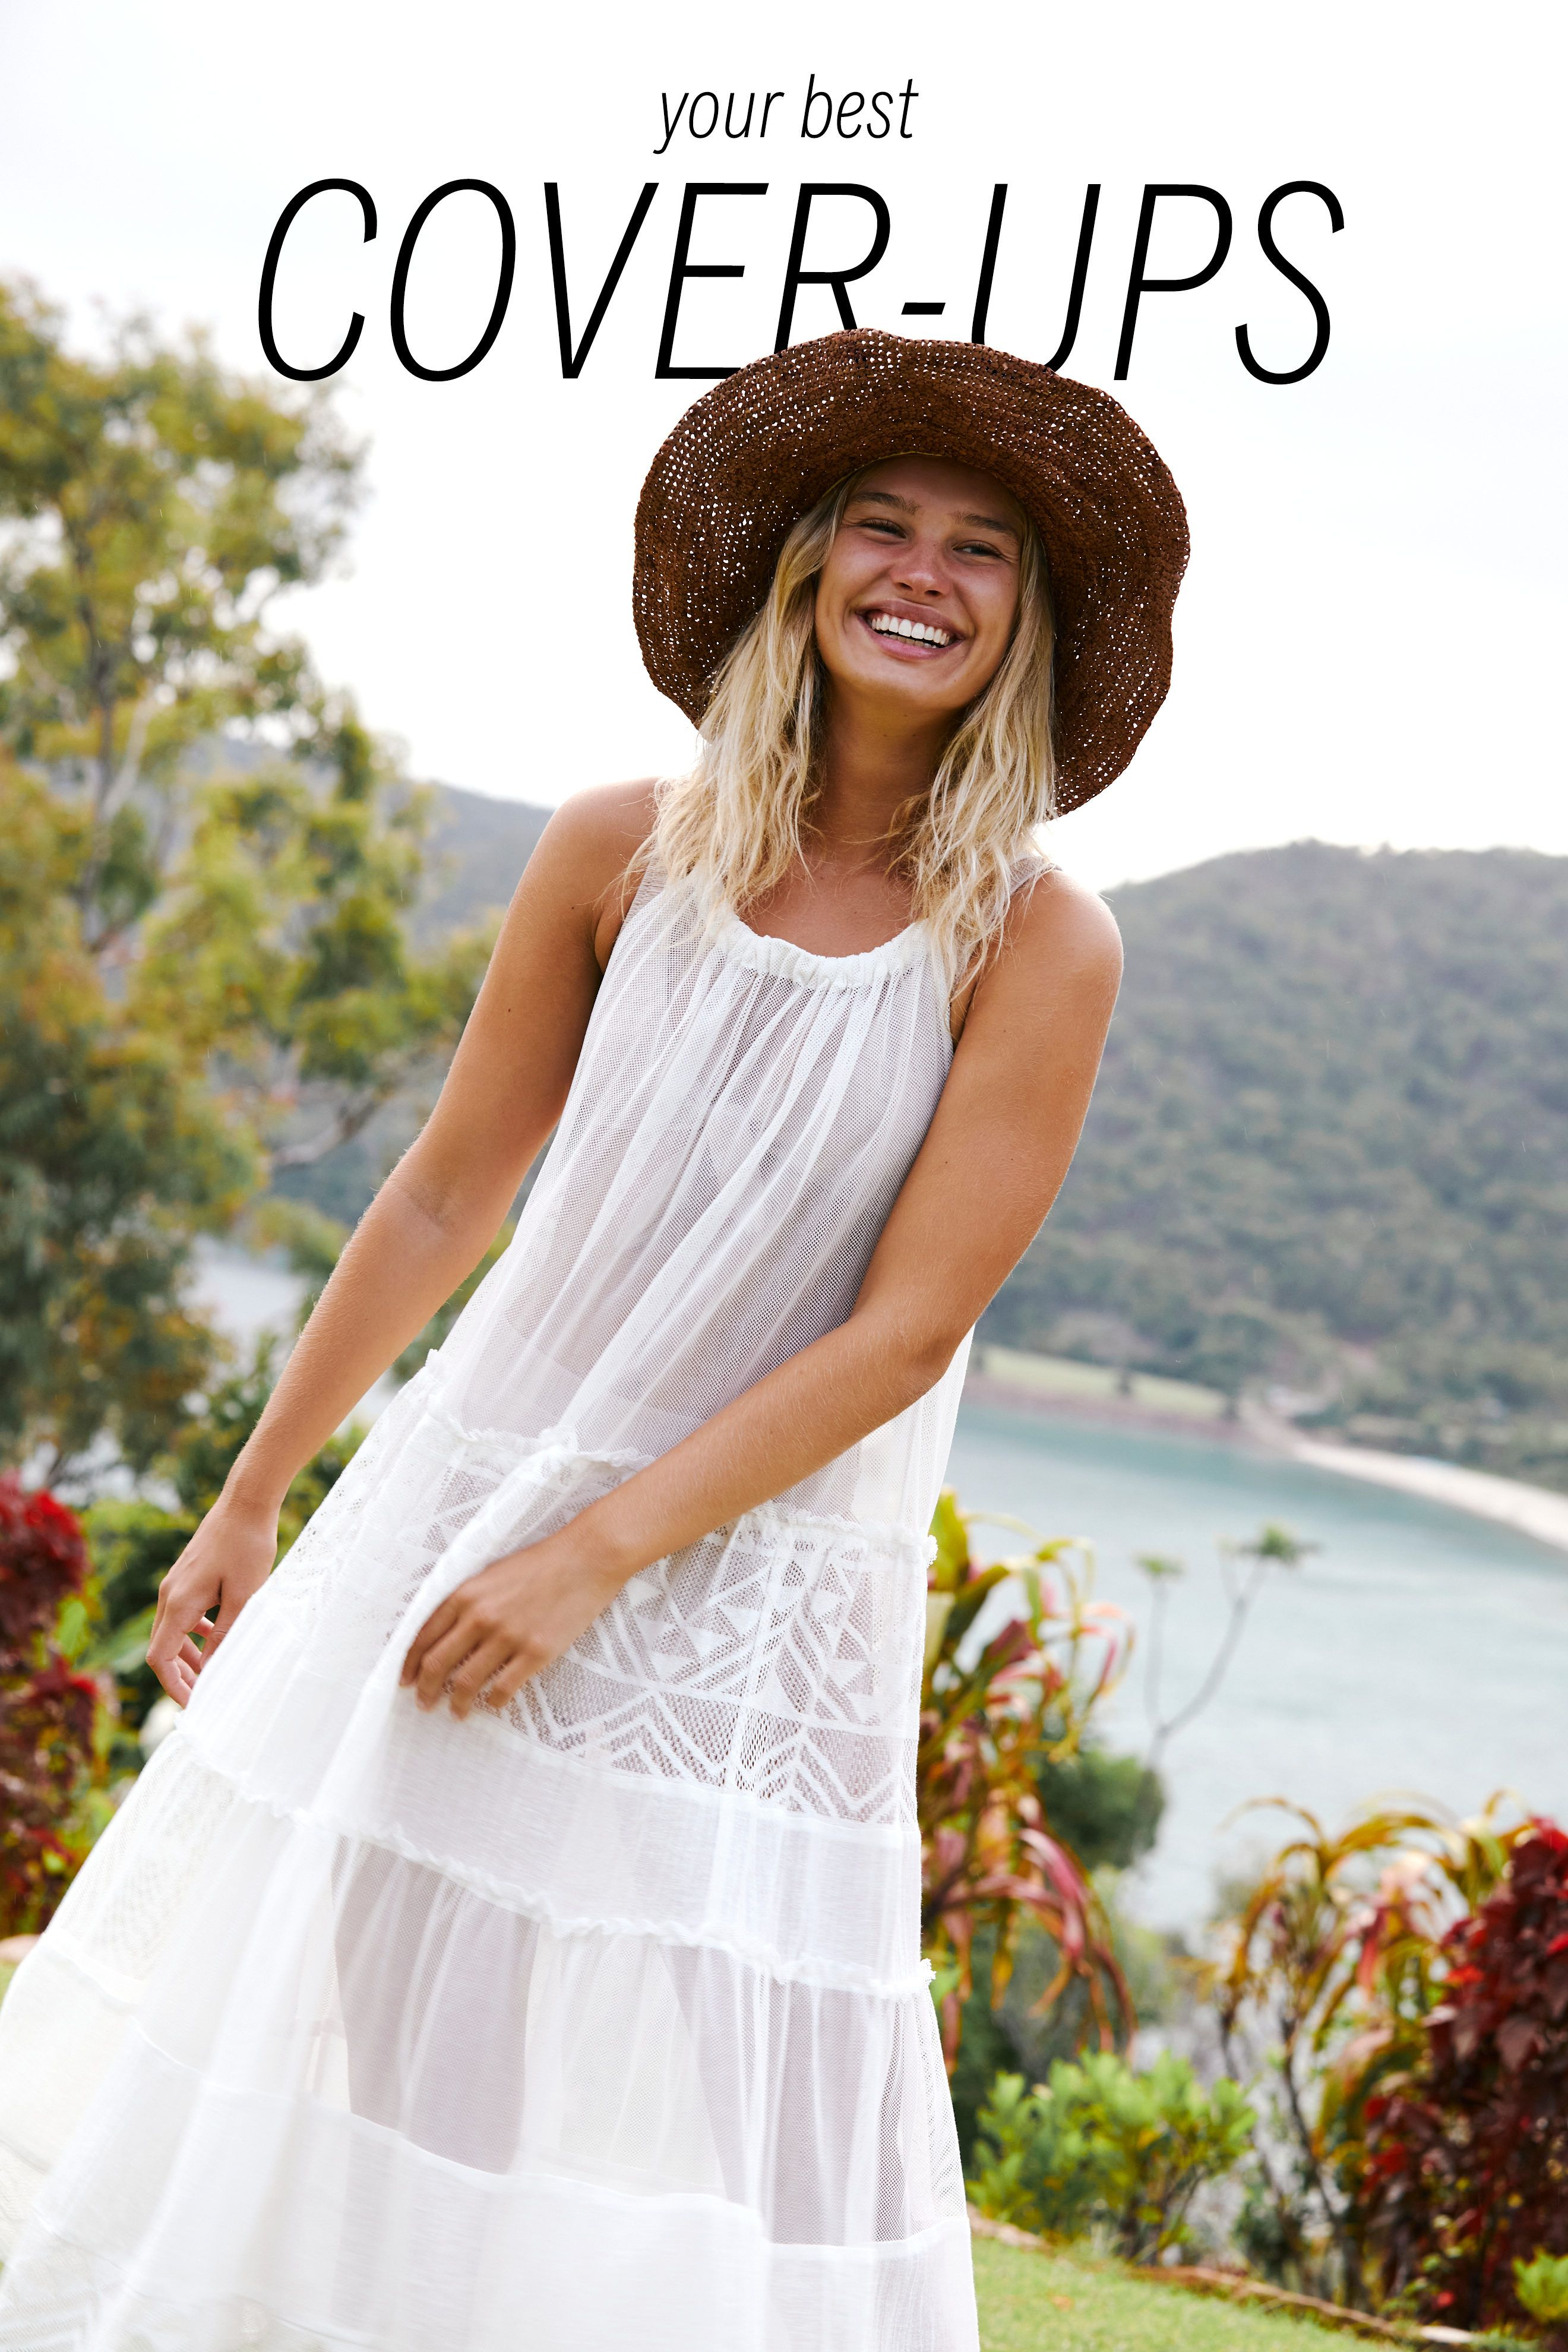 You Best Cover Ups Free People Dress Summer Dresses Dresses [ 3960 x 2640 Pixel ]